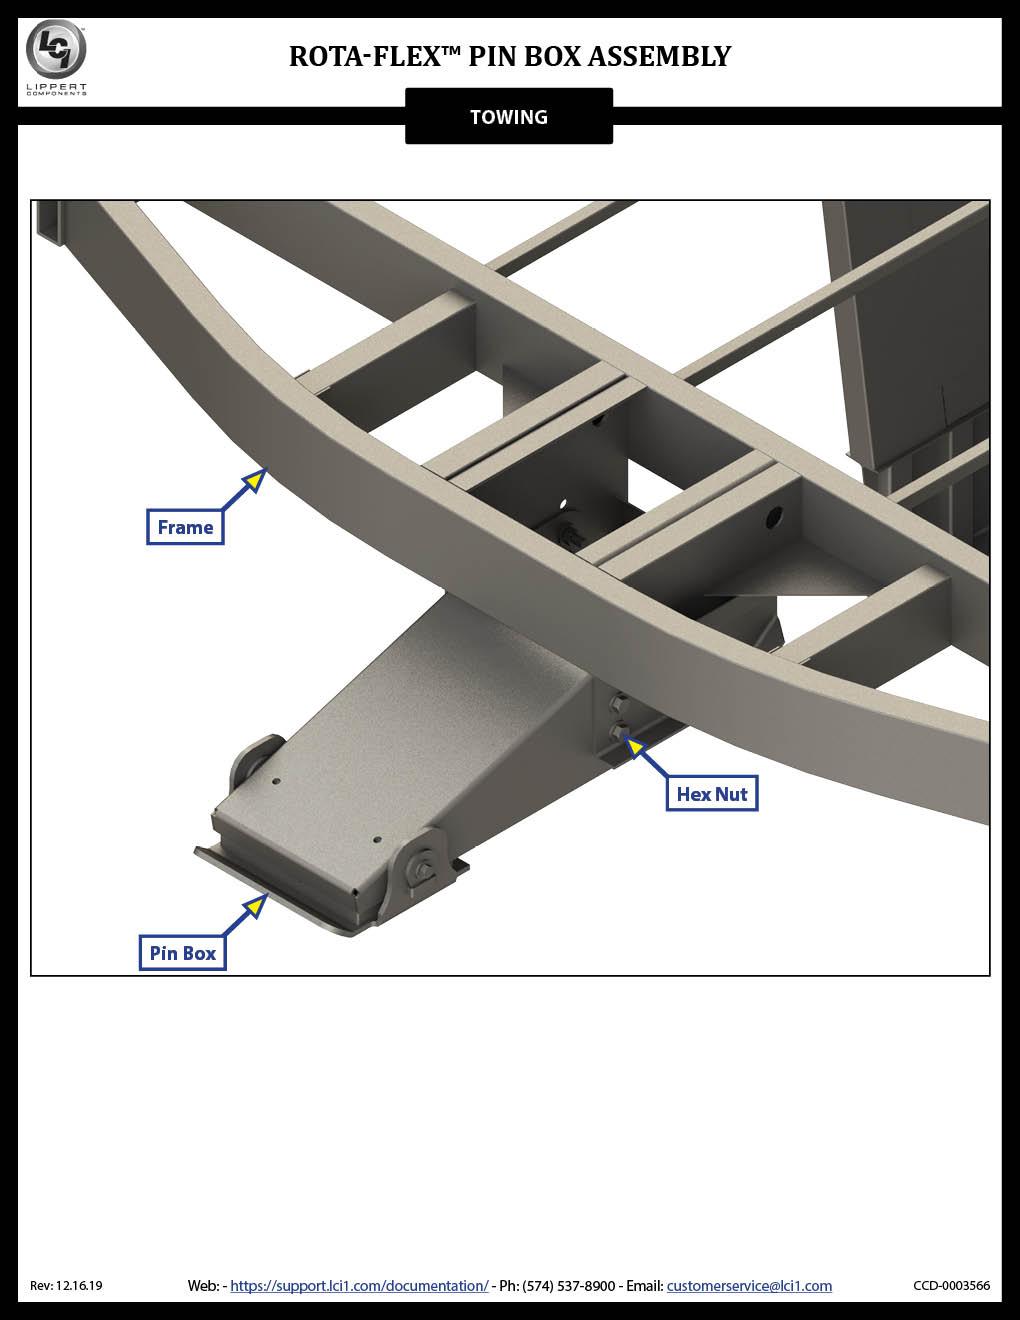 Rota-Flex™ Pin Box Assembly